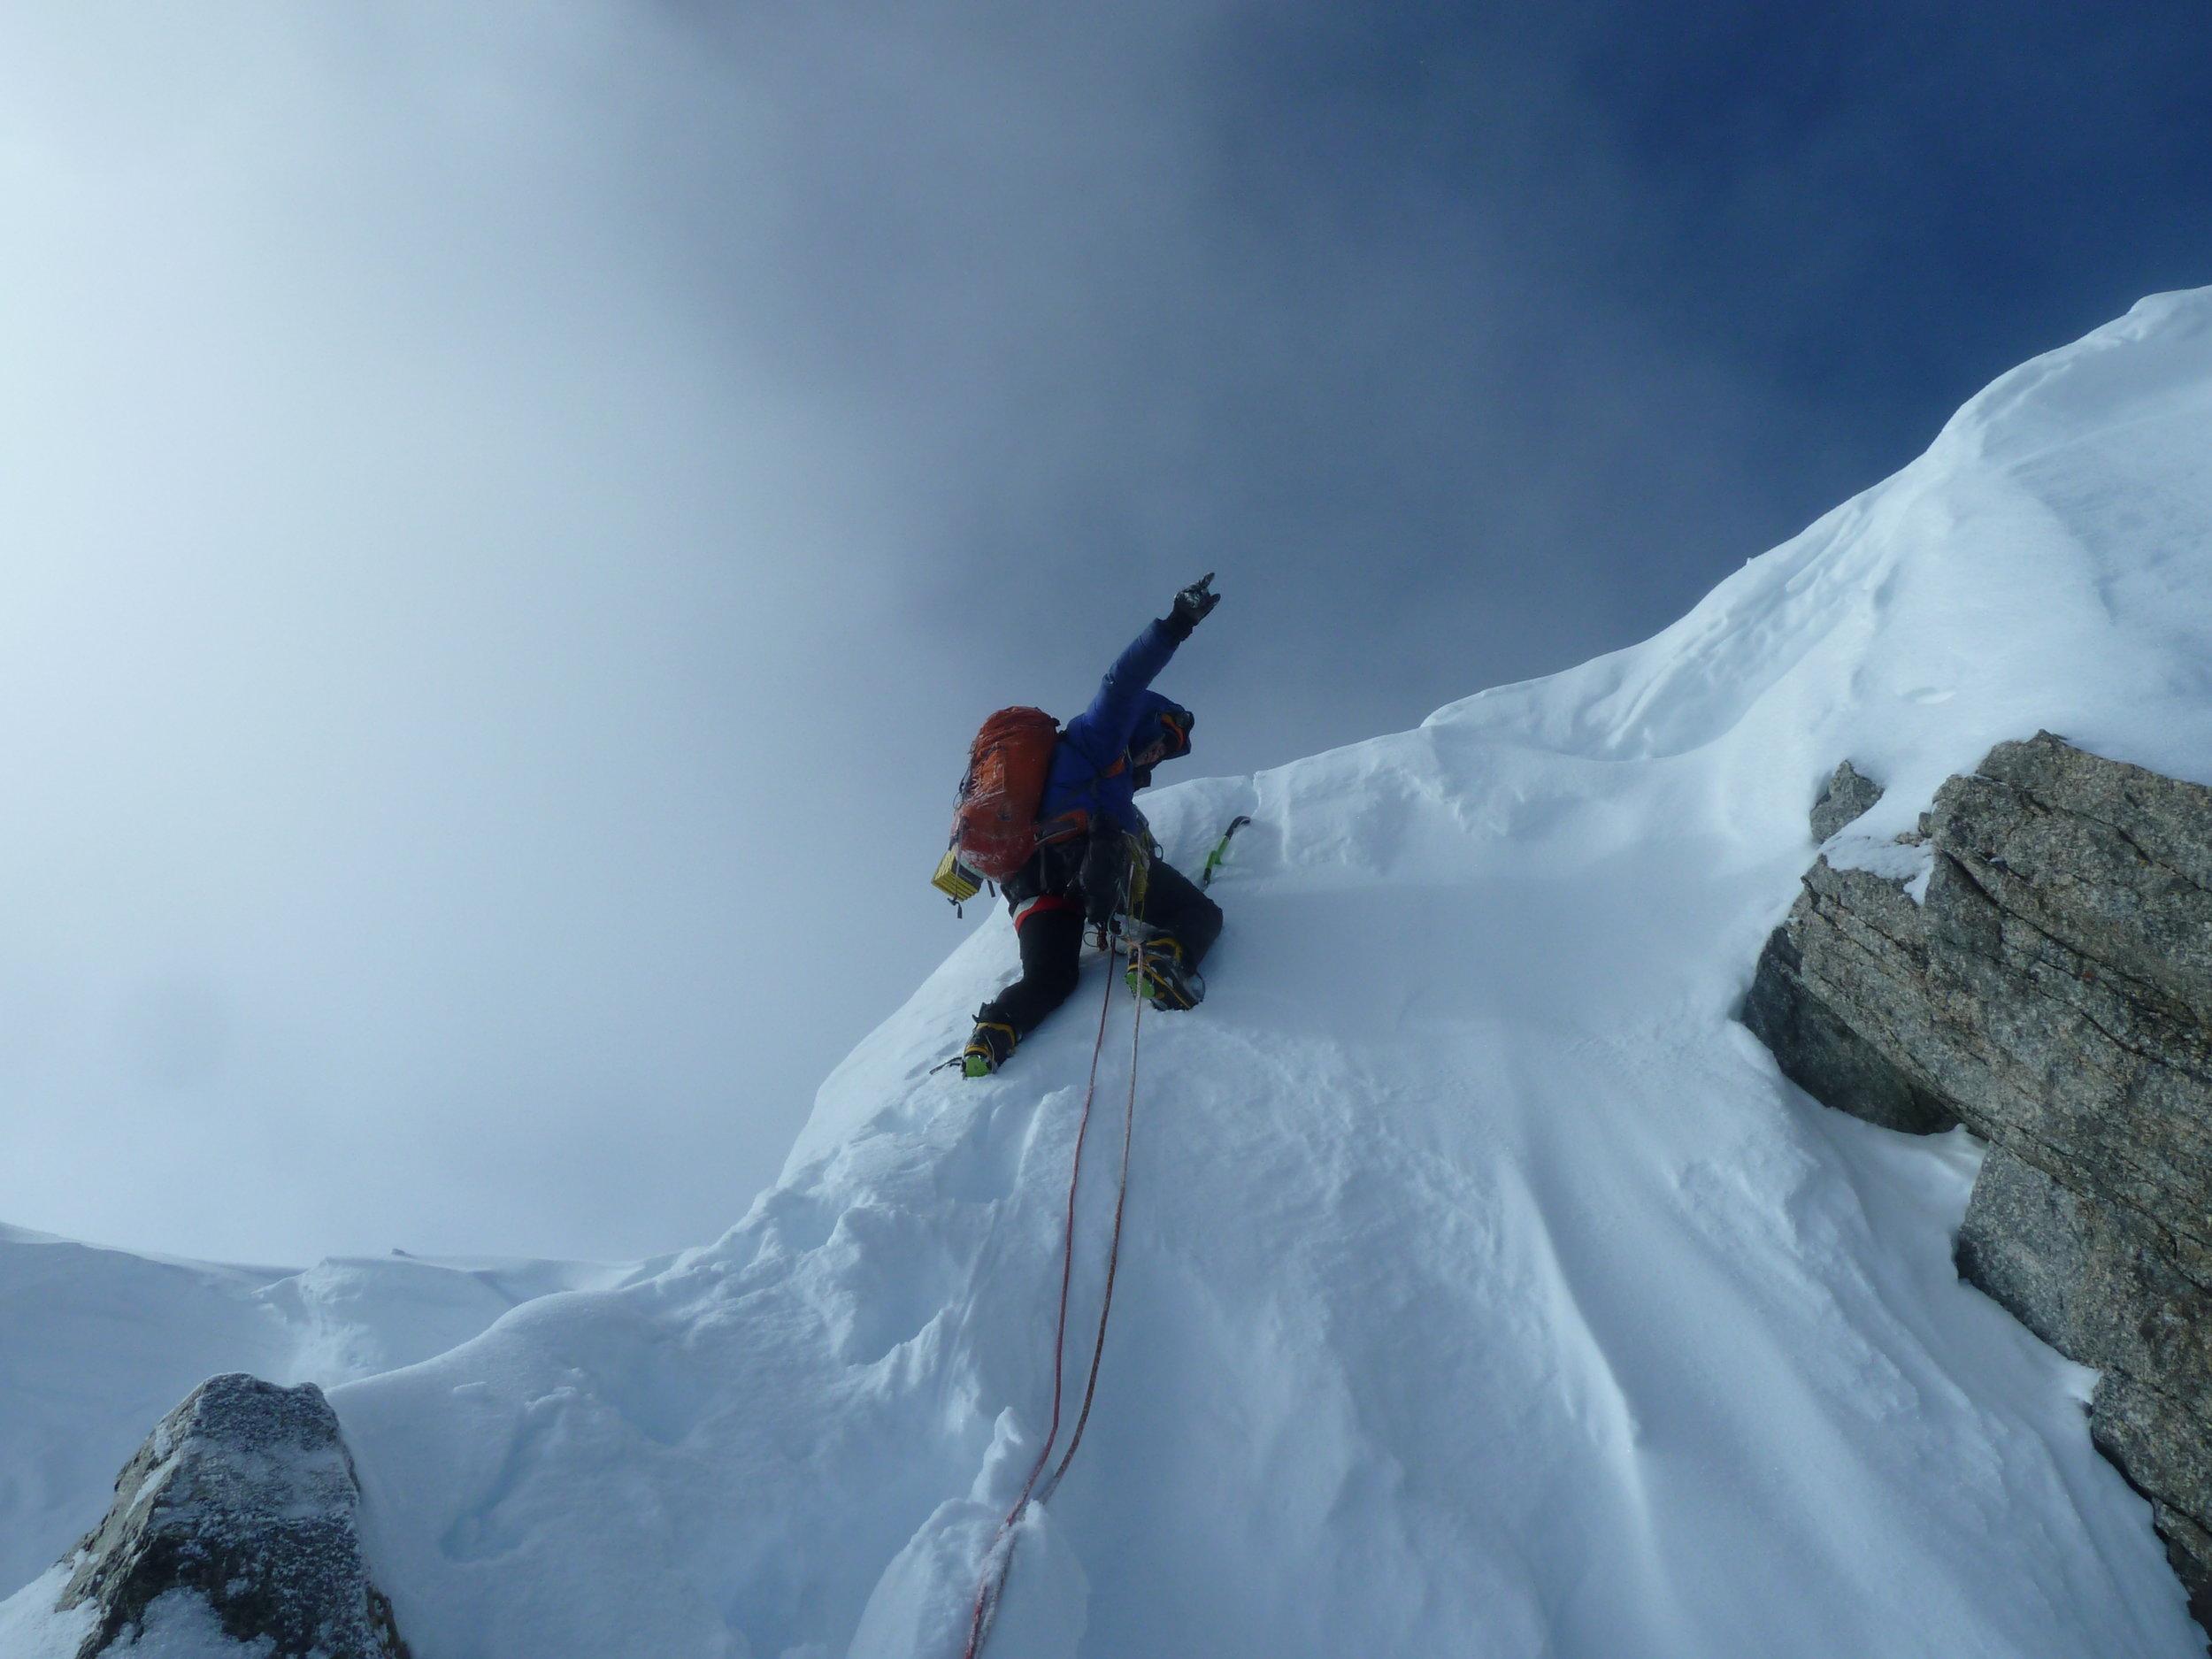 pete graham on the walker spur, winter ascent, grandes jorasses, mont blanc massif. Chamonix.